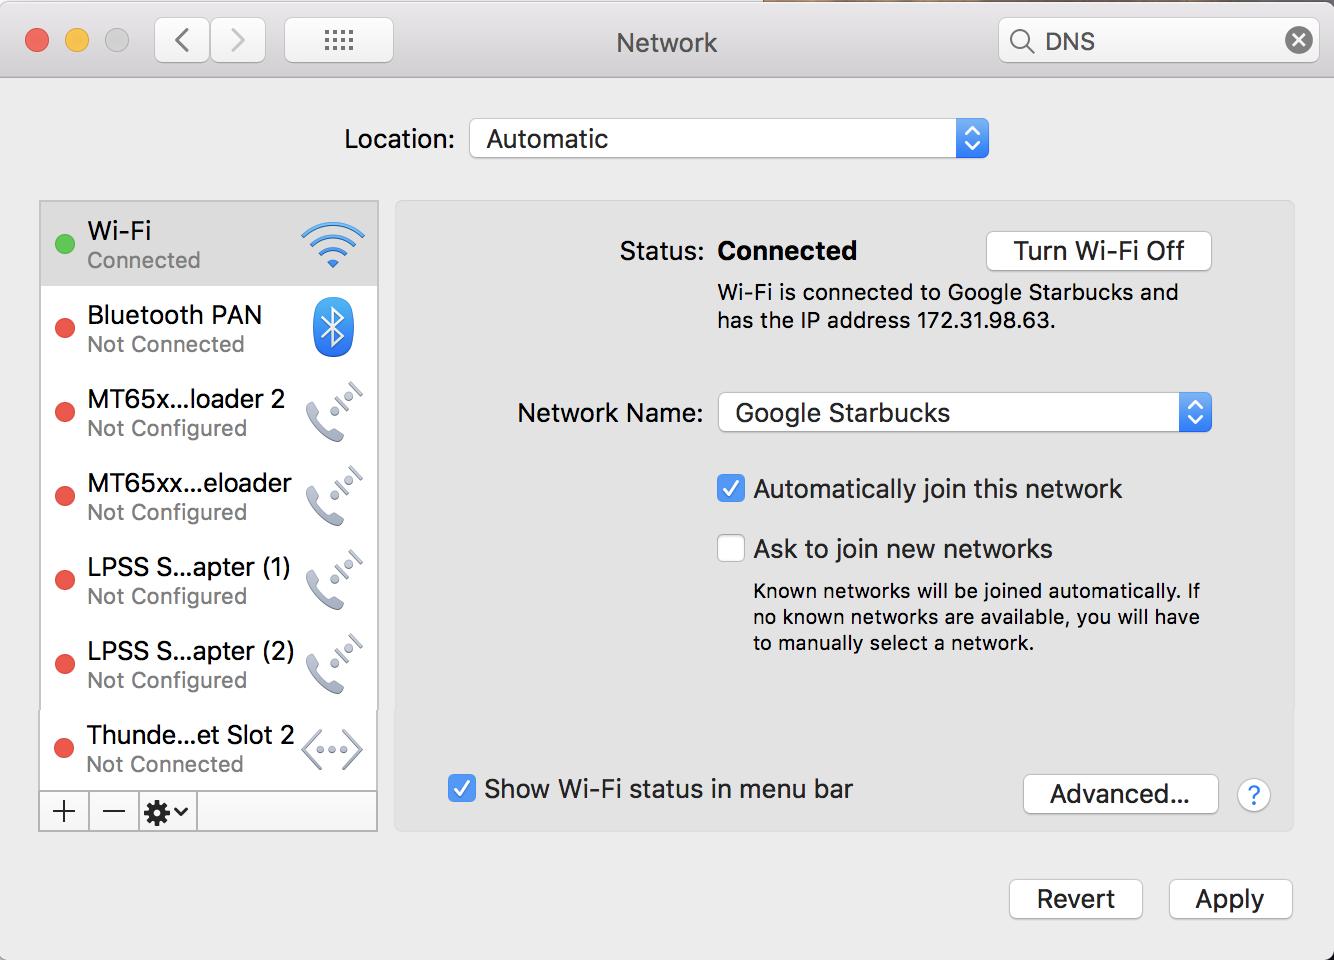 cloudflare 1.1.1.1 service setup on macos x